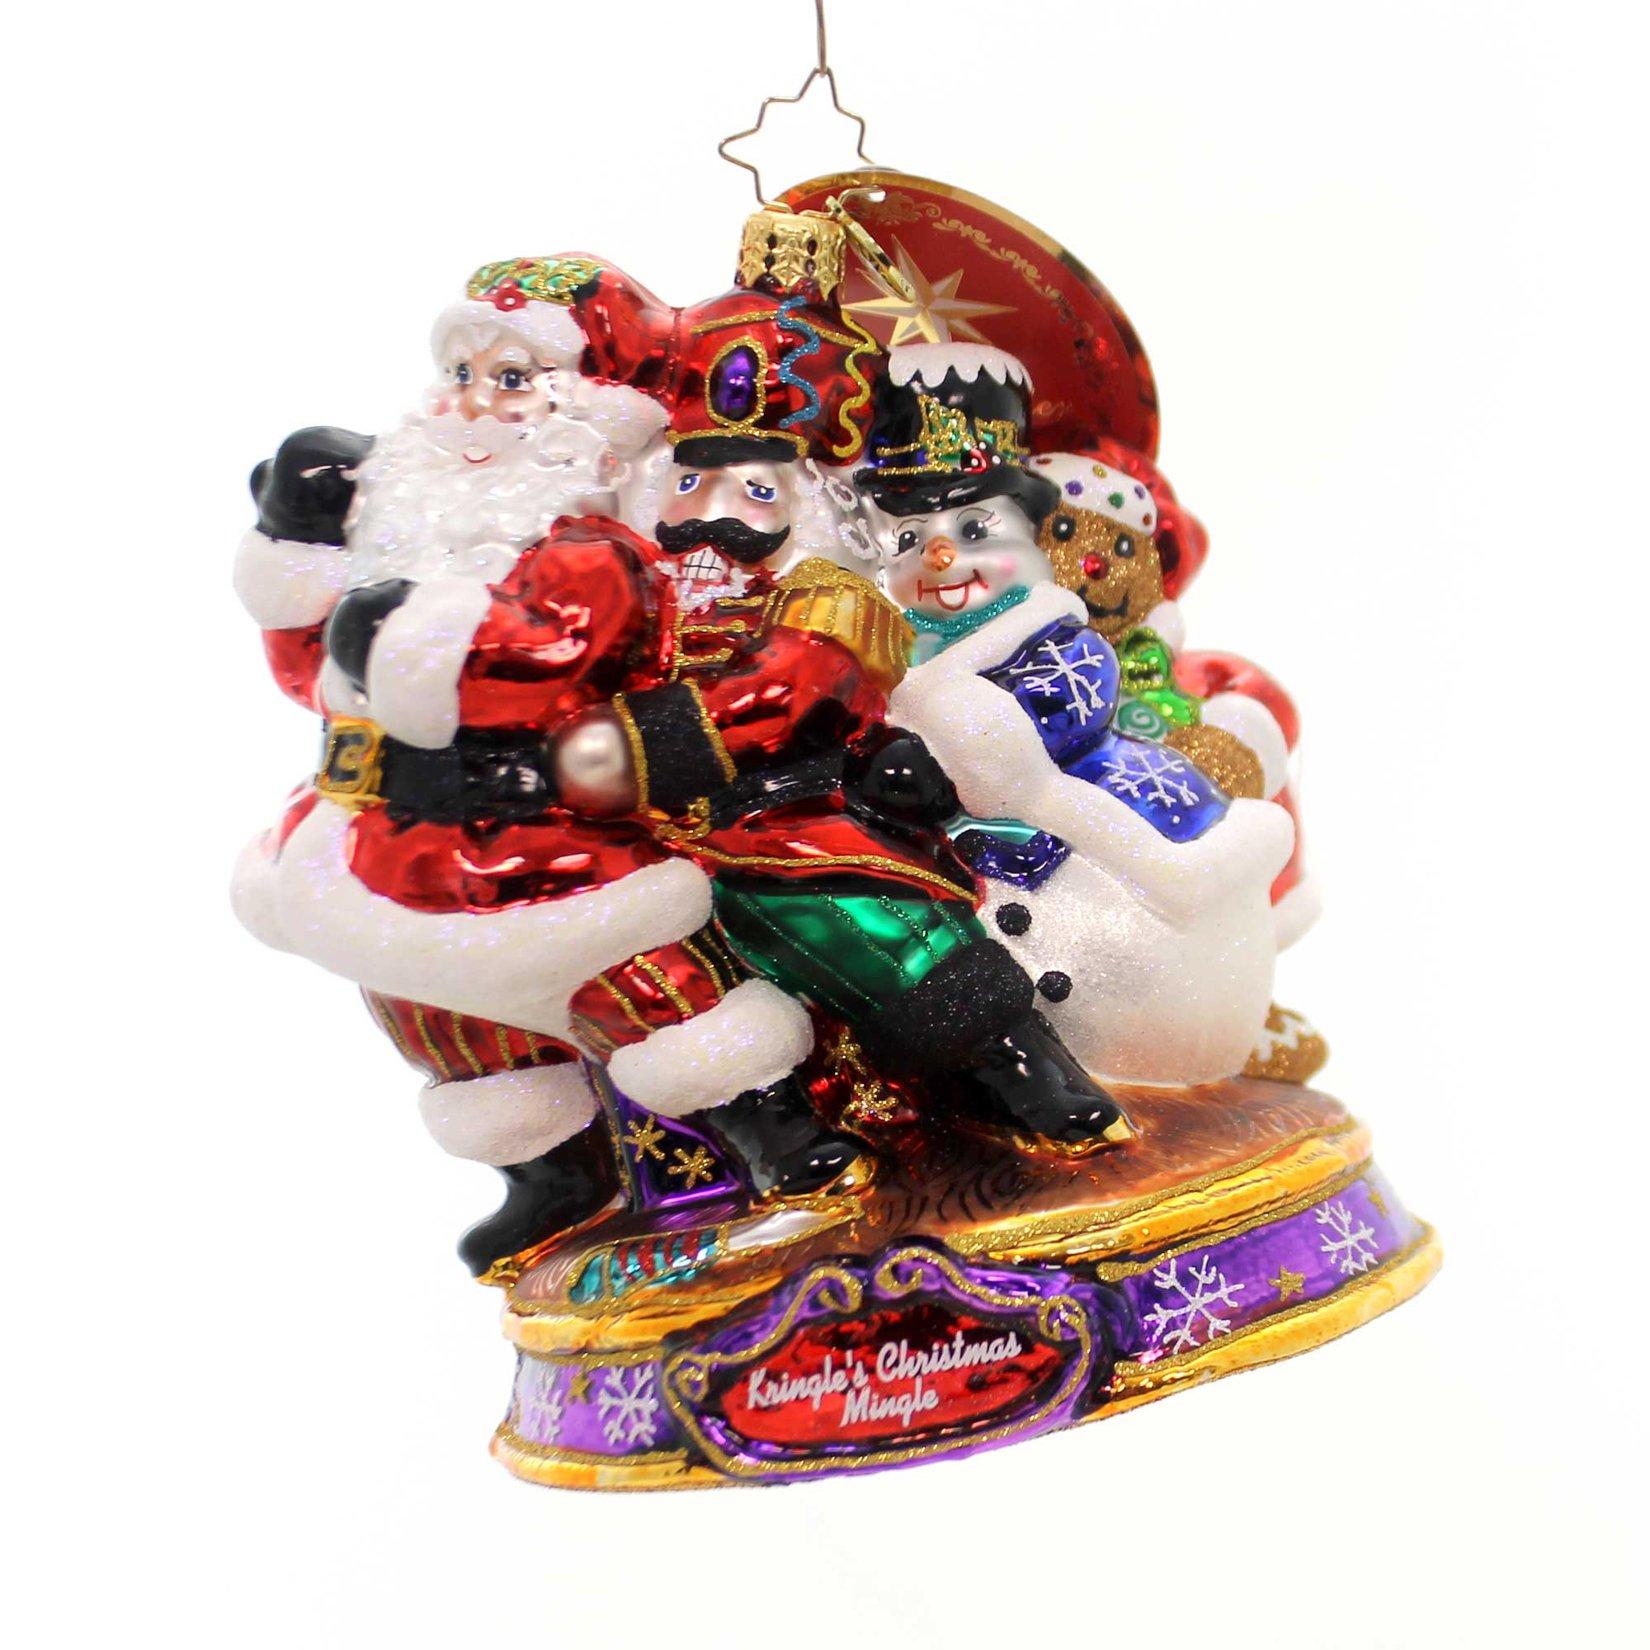 Christopher Radko Conga! Santa Kringle's Christmas Mingle Ornament